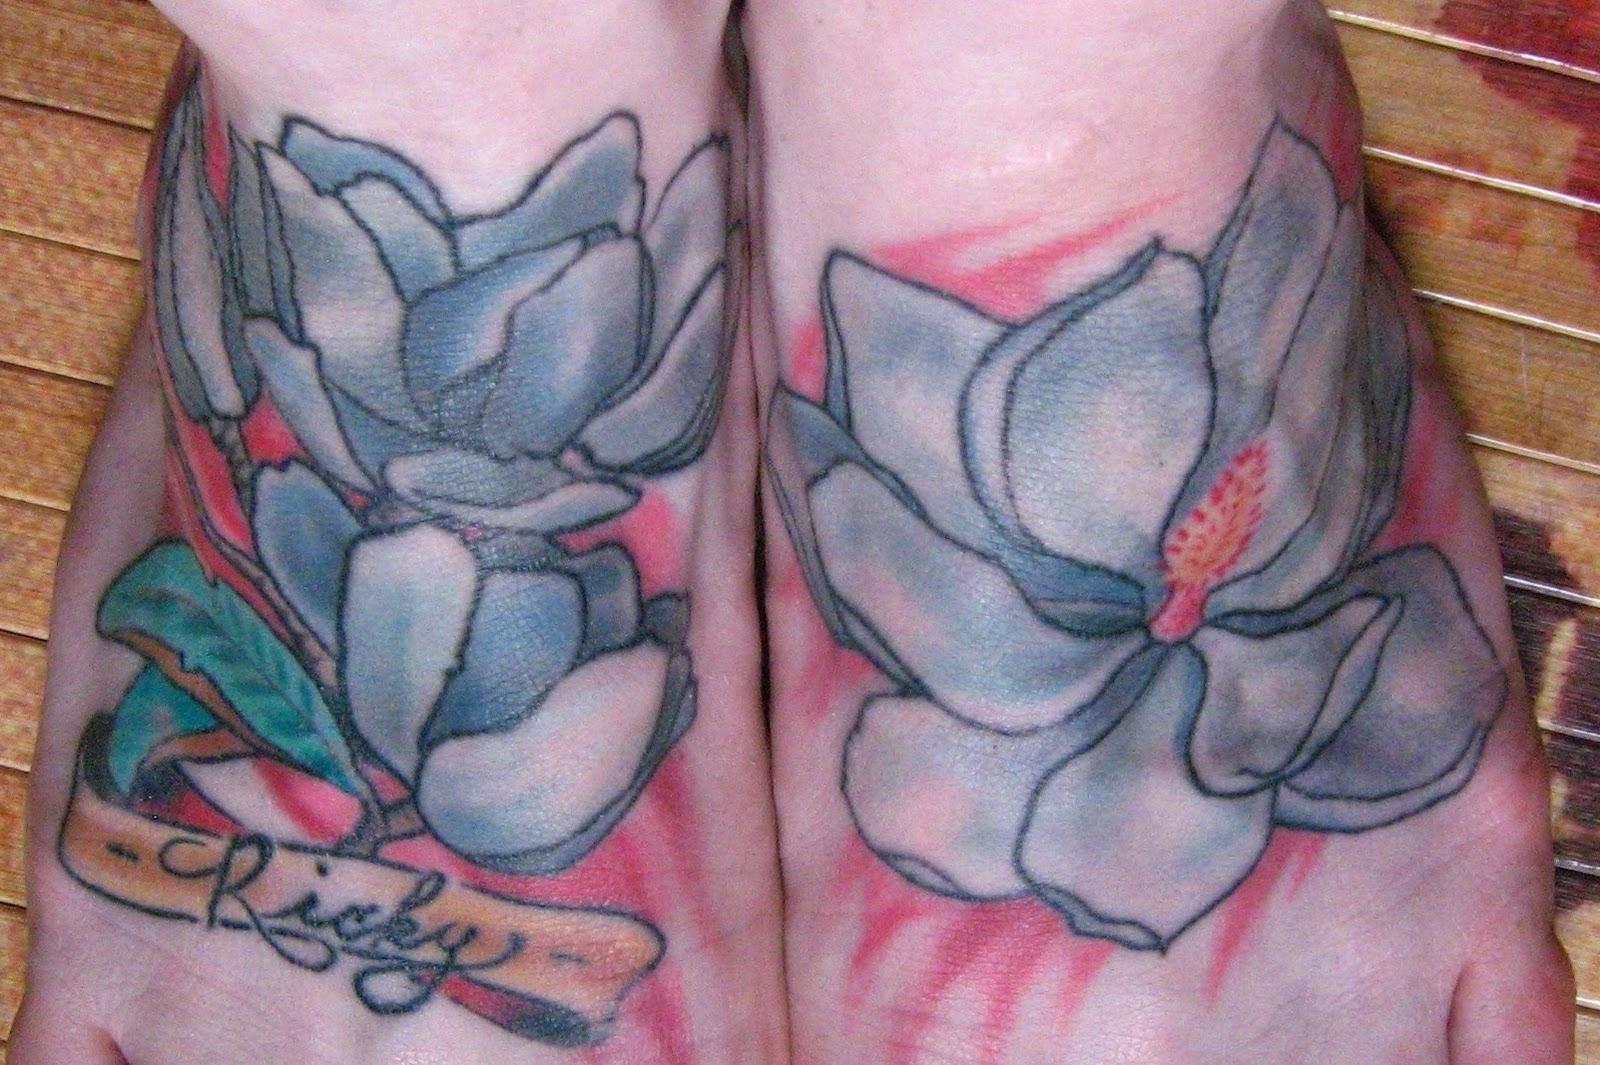 Brad Pitt Grey Suit Gun Tattoo